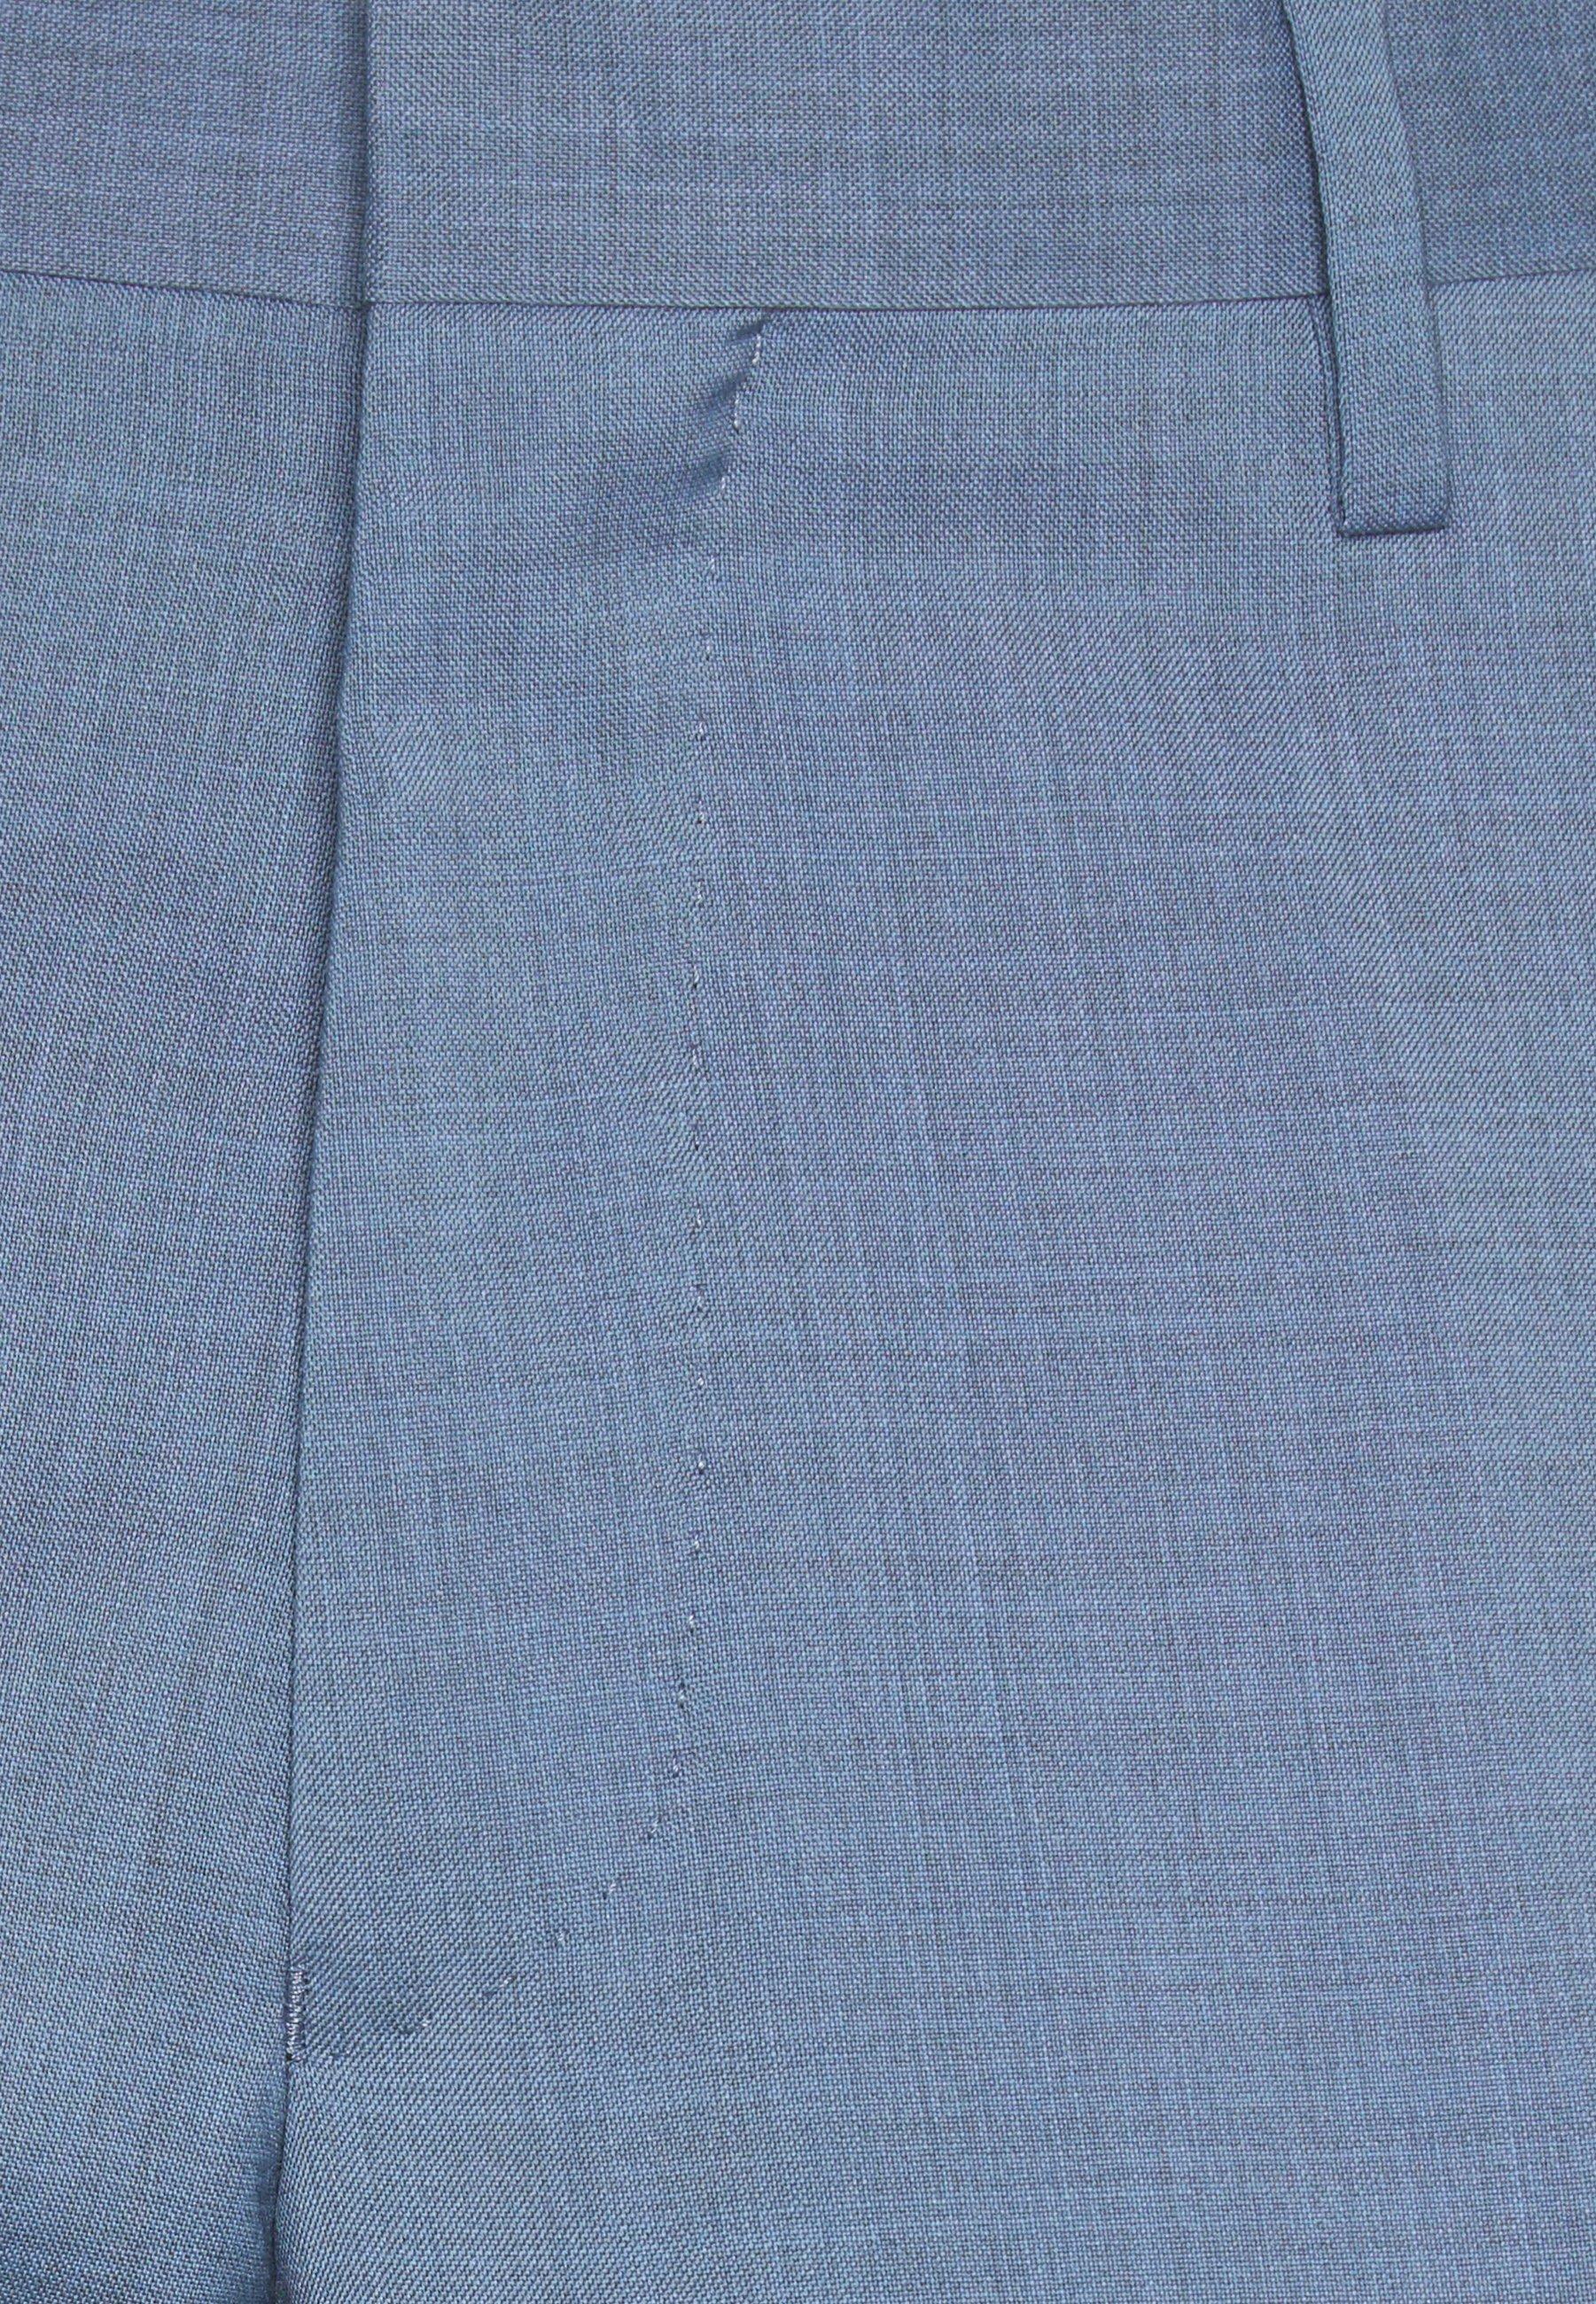 onitsuka tiger mexico 66 new york zalando jeans top